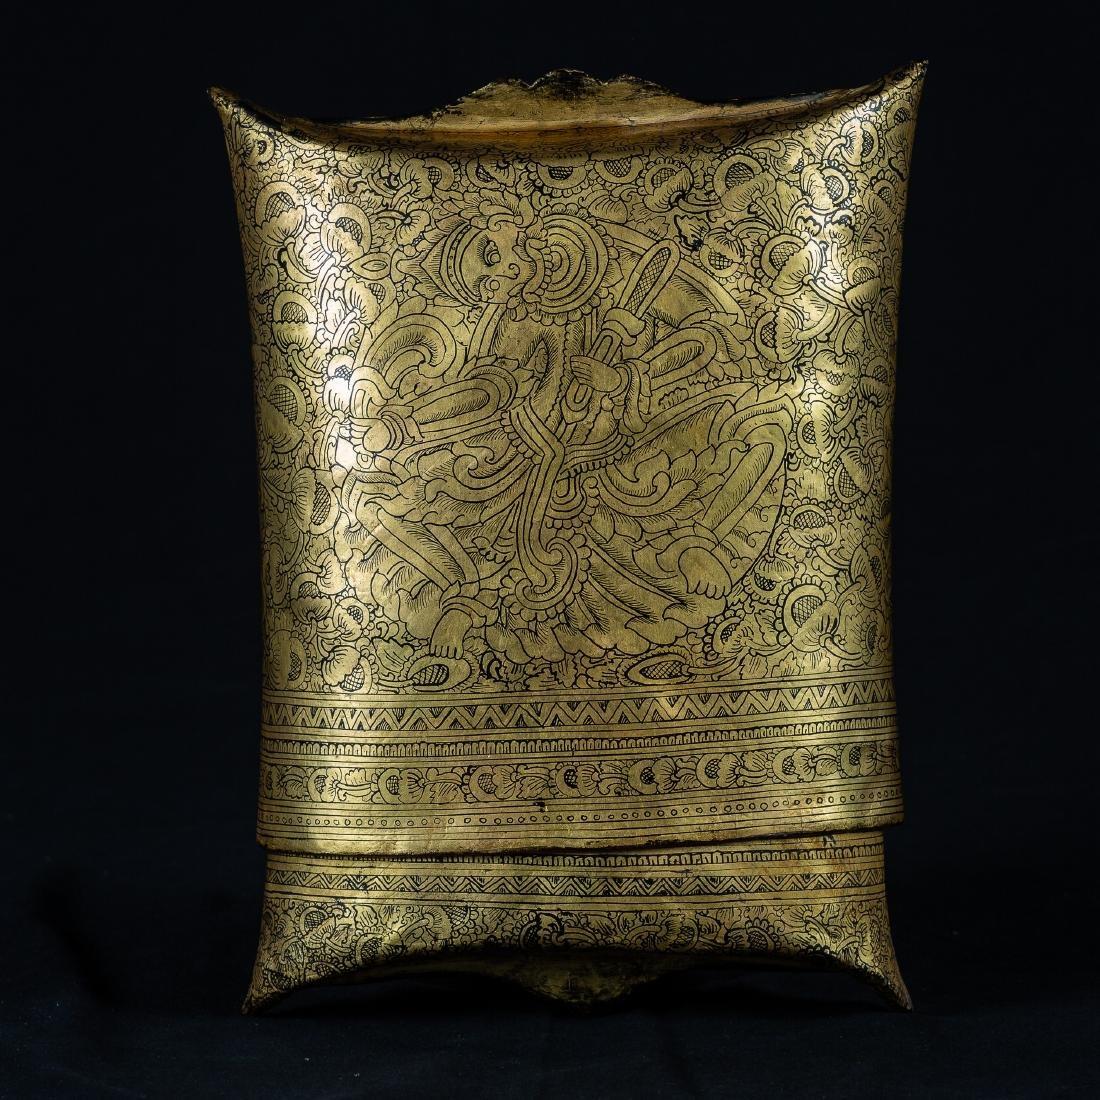 19th Century Burmese Shwe Zawa Lacquer Money Pouch - 2